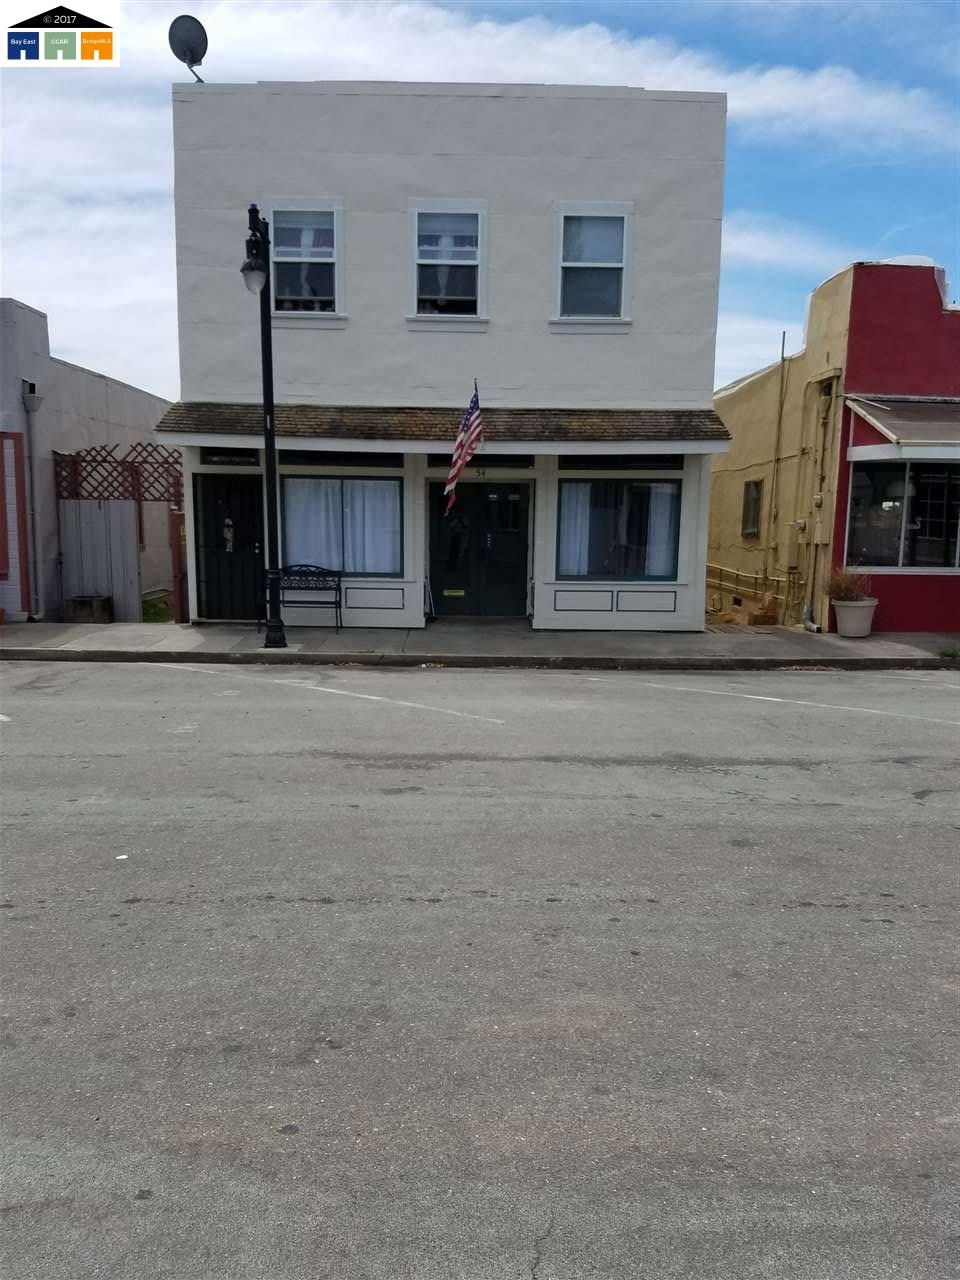 Multi-Family Home for Sale at 54 Main Street Isleton, California 95641 United States